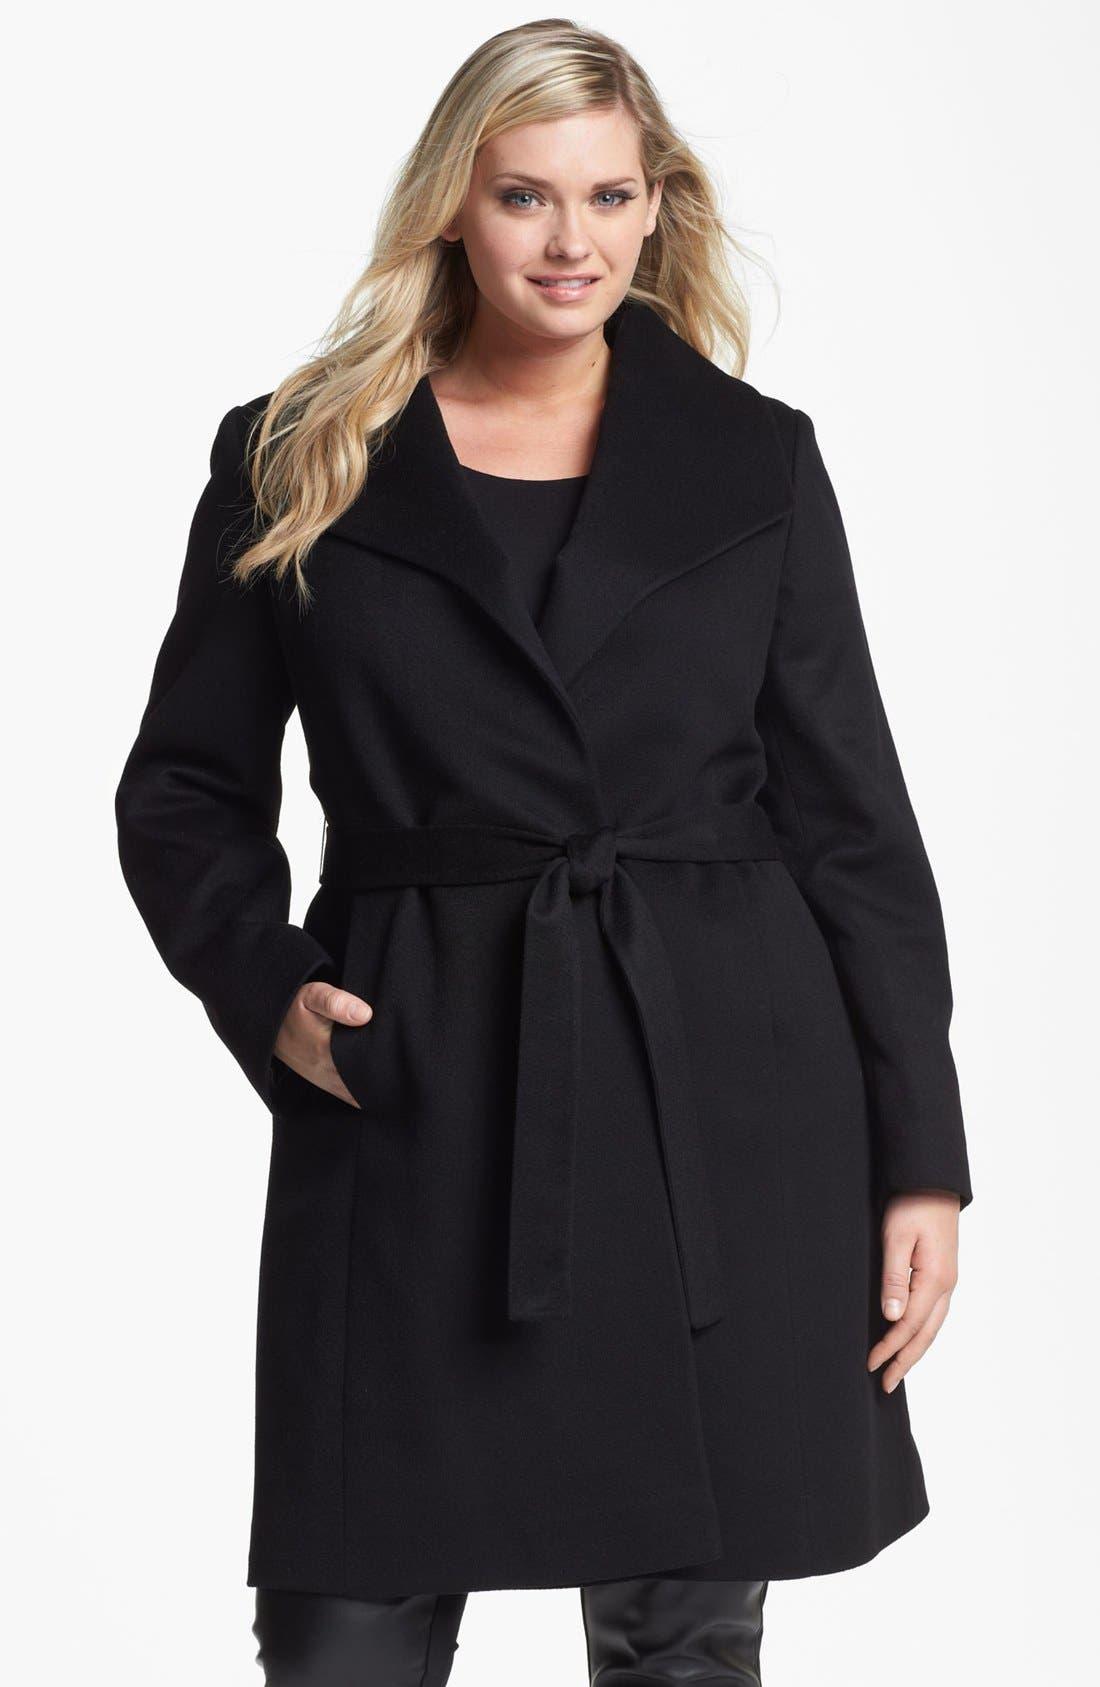 Alternate Image 1 Selected - Fleurette Wing Collar Cashmere Wrap Coat (Plus Size)